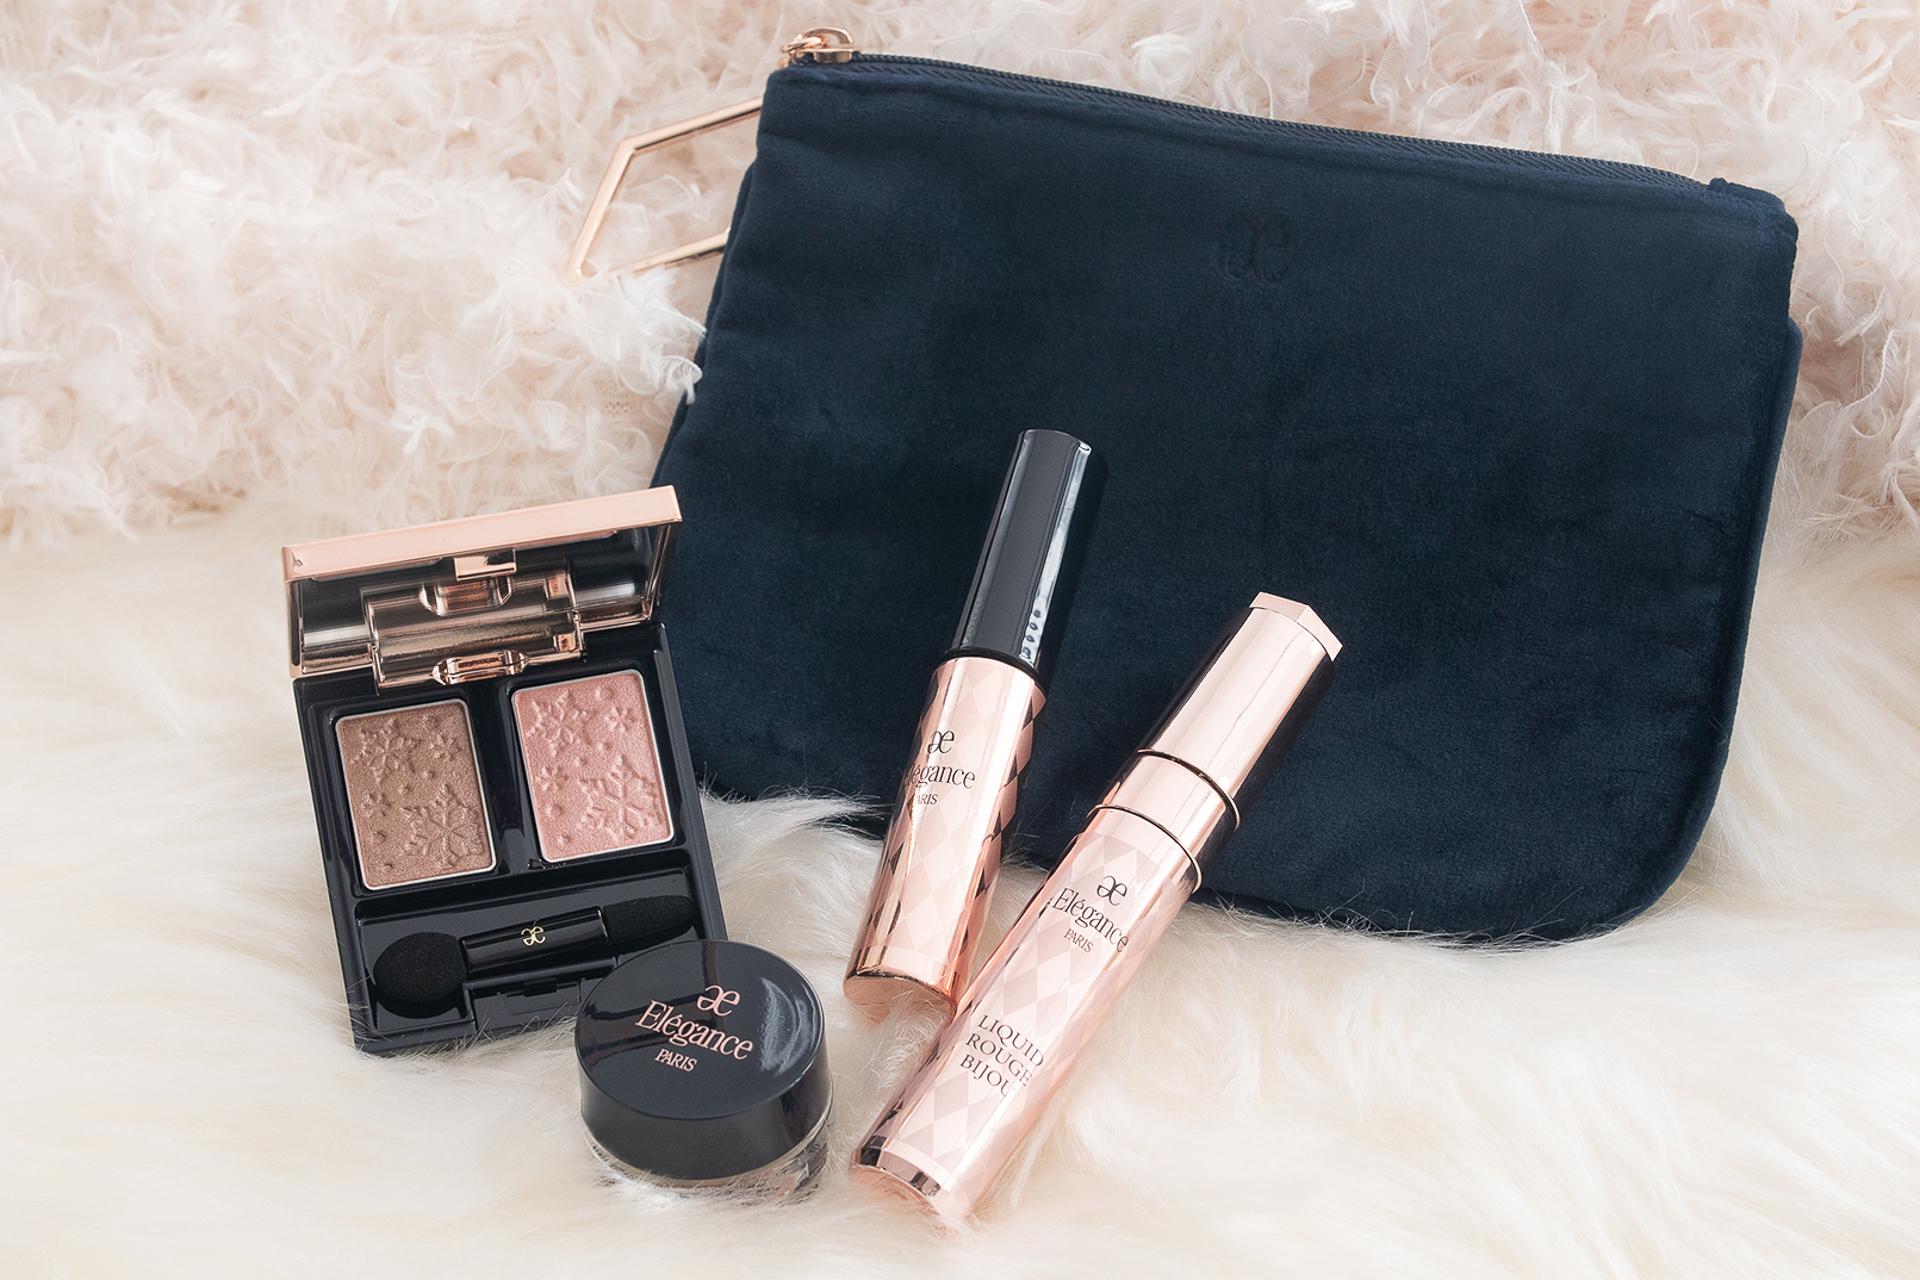 ⑤ Elegance cosmetics